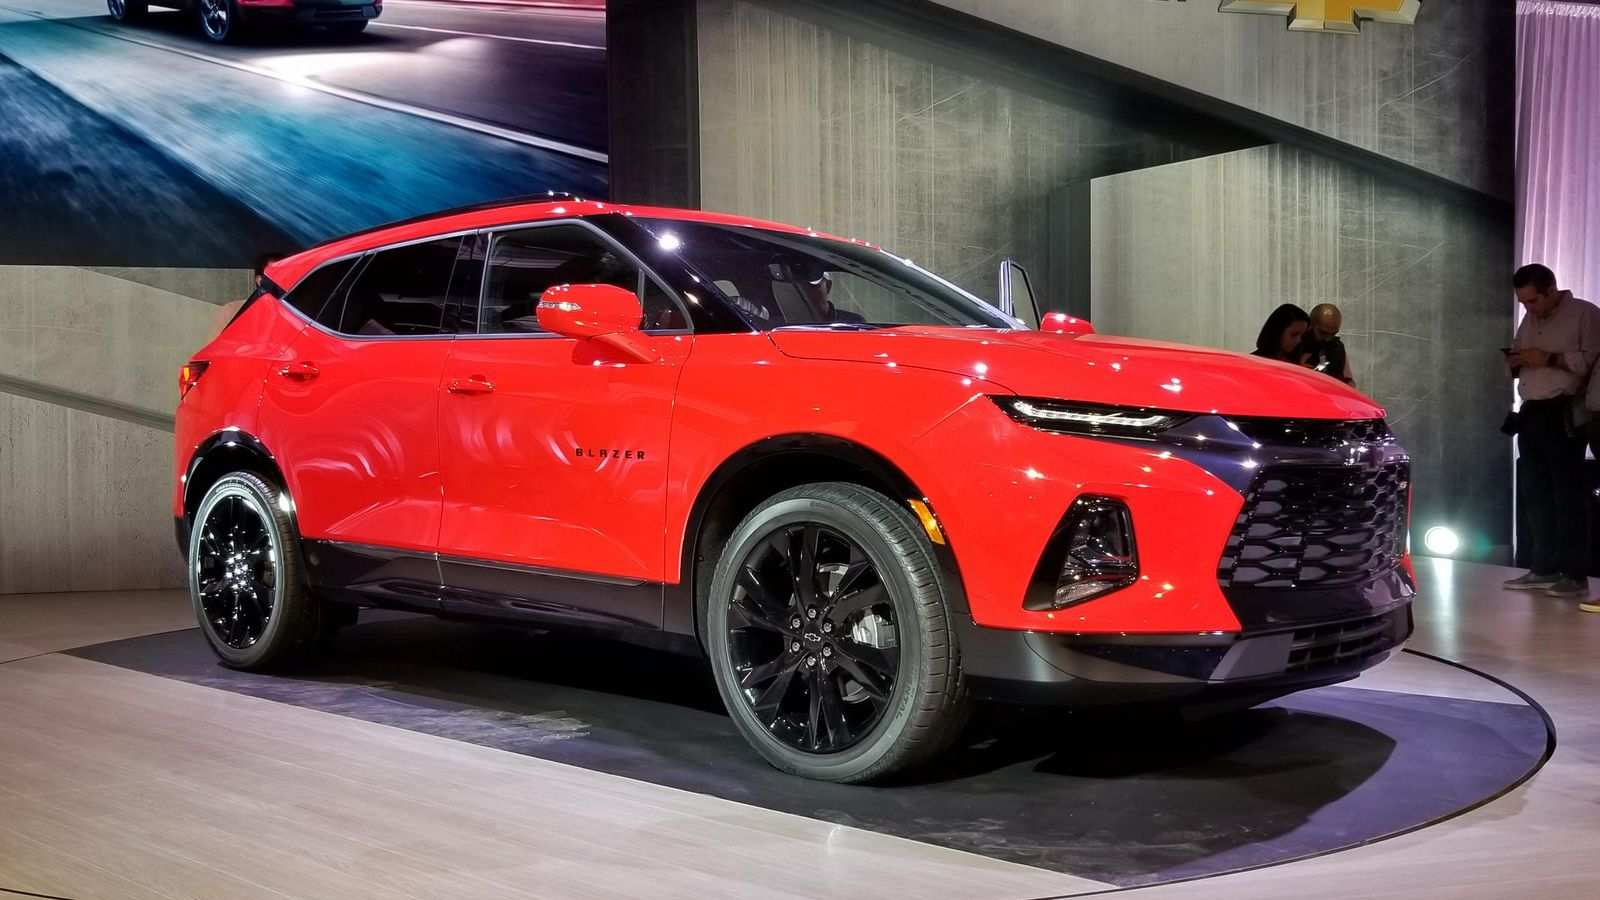 51 All New 2019 Chevrolet Trailblazer Ss Price for 2019 Chevrolet Trailblazer Ss